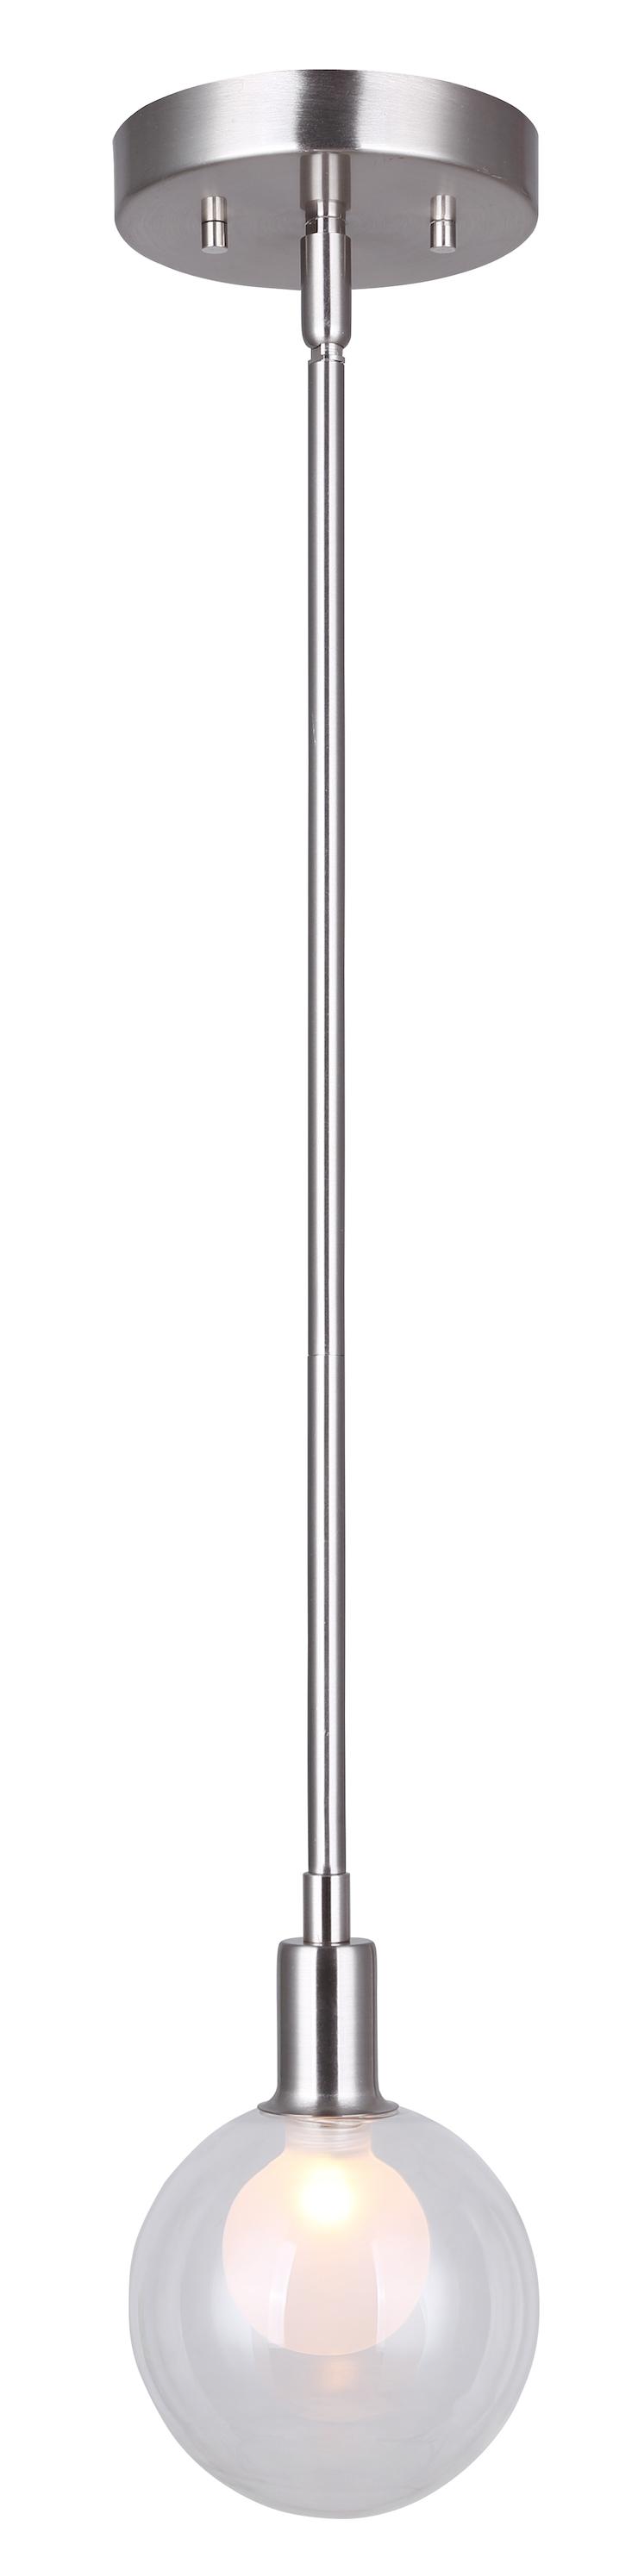 luminaire suspendu healey ipl346b01bn9. Black Bedroom Furniture Sets. Home Design Ideas